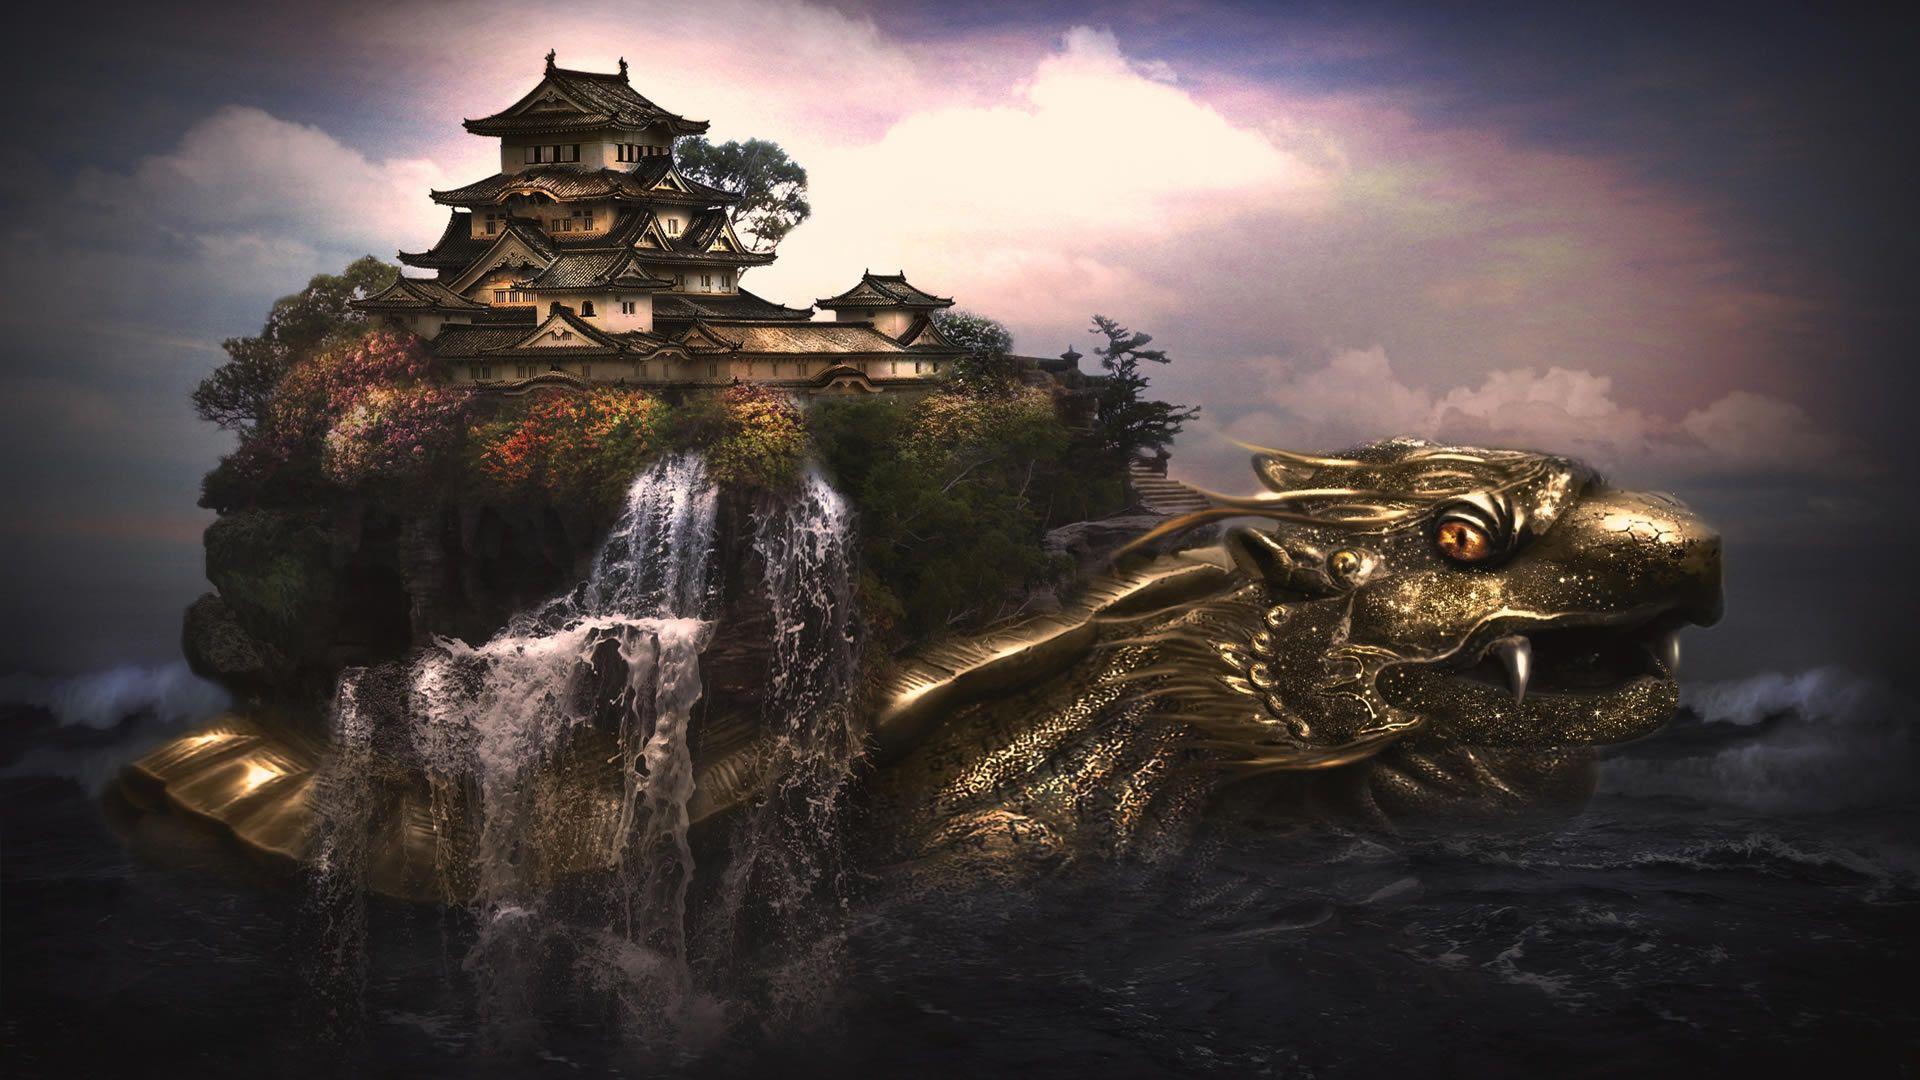 Chinese boat wallpaper | Art | Pinterest | Chinese boat, Chinese ...